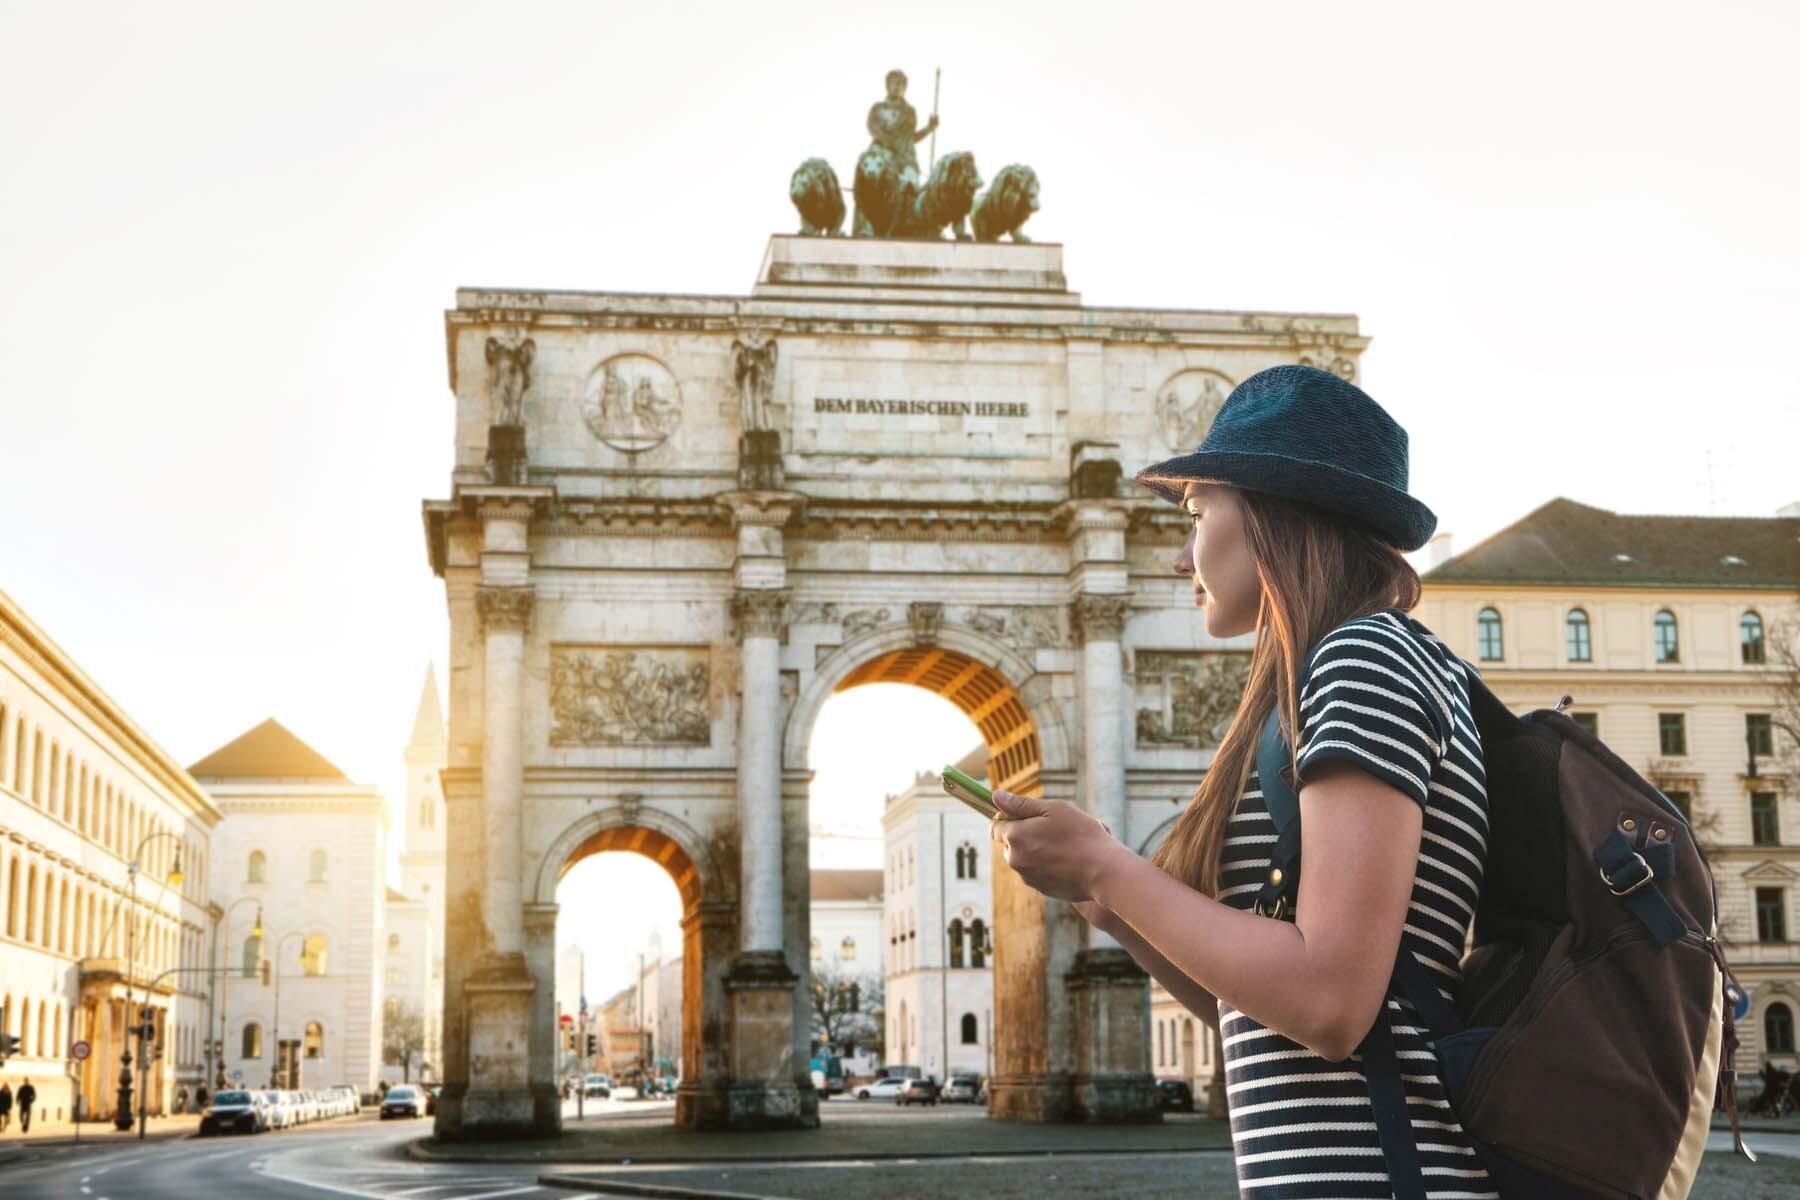 woman tourist phone